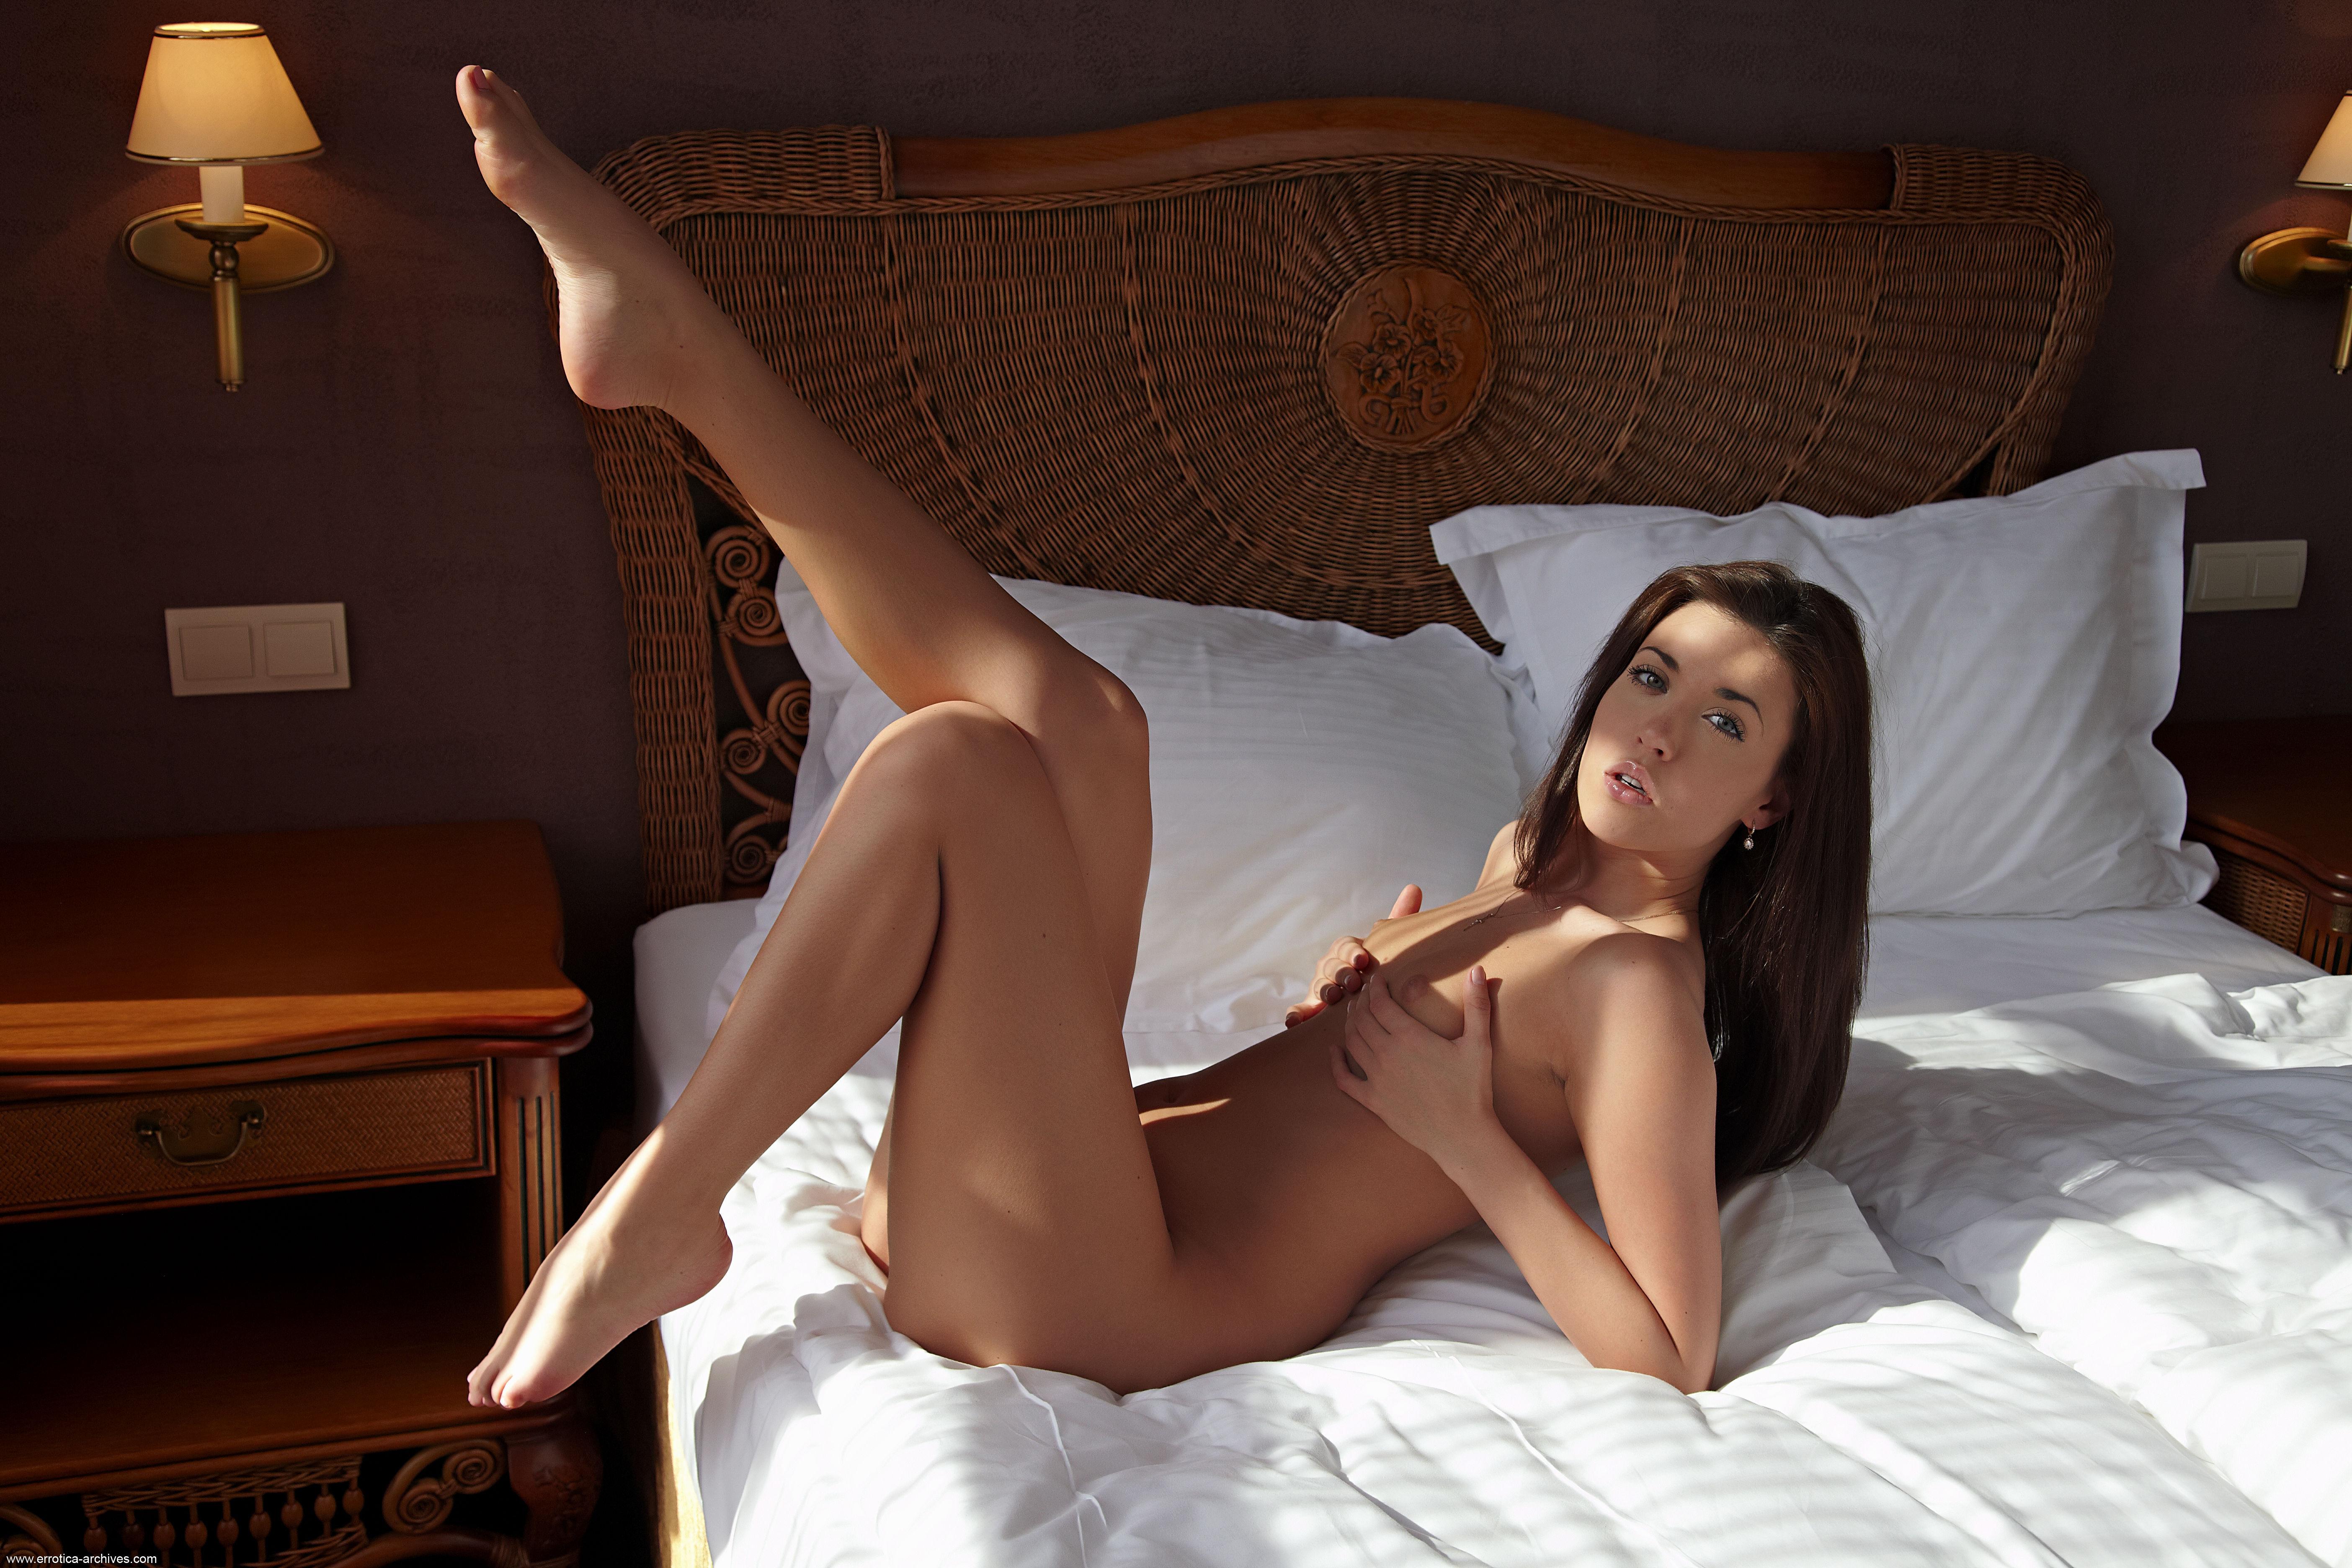 Wallpaper Malvina, Brunette, Sexy Girl, Adult Model, Nude -7652